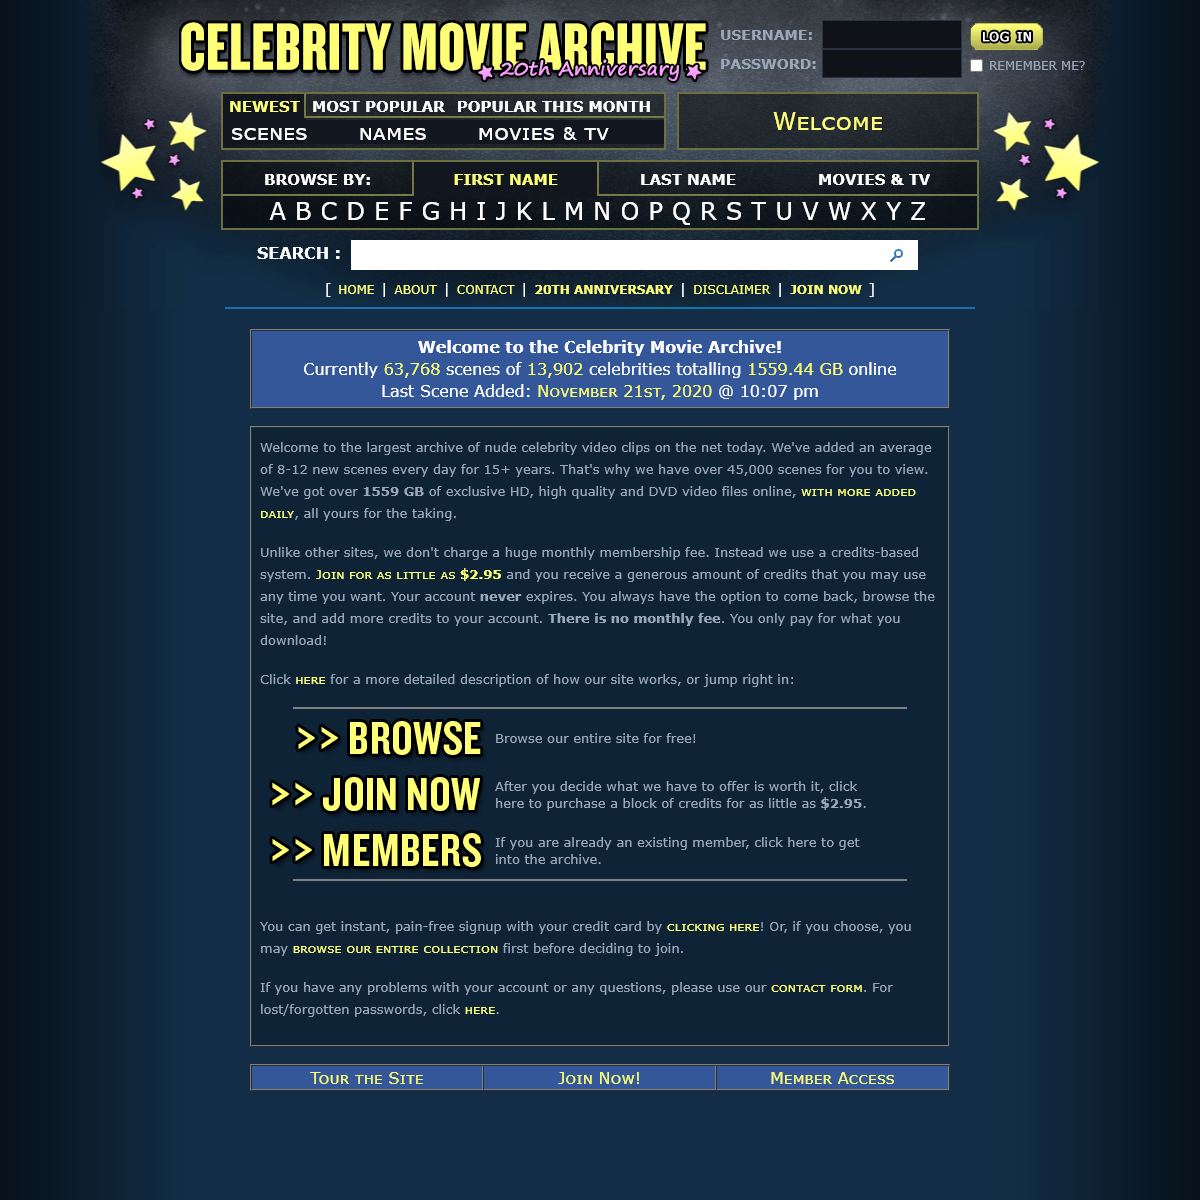 www.celebritymoviearchive.com - Archived 2021-06-13